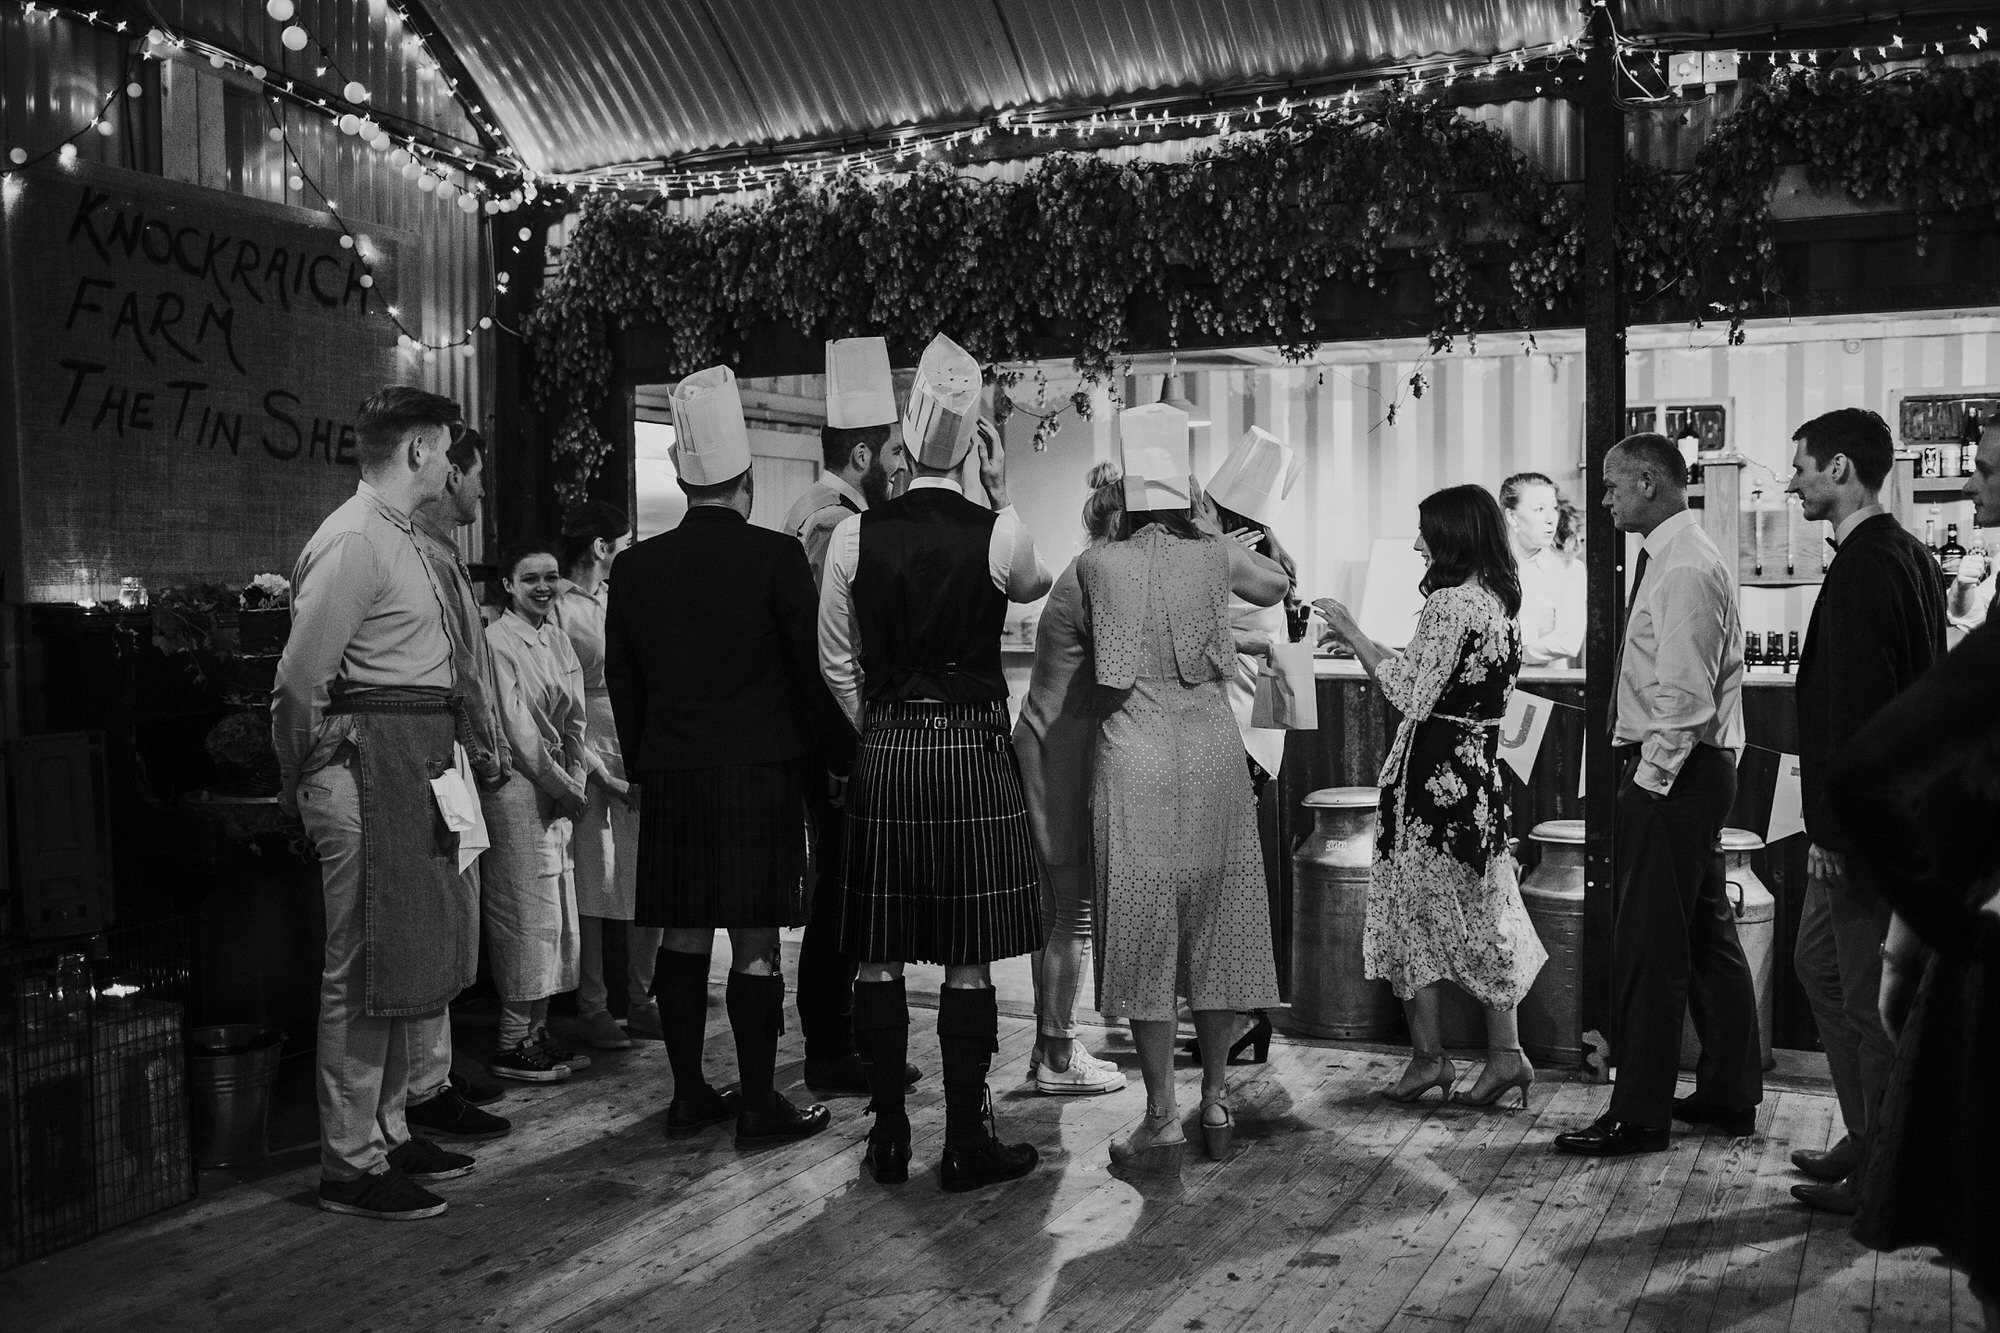 068 TIN SHED KNOCKRAICH FARM WEDDING ALTERNATIVE BRIDE ZOE ALEXANDRA PHOTOGRAPHY